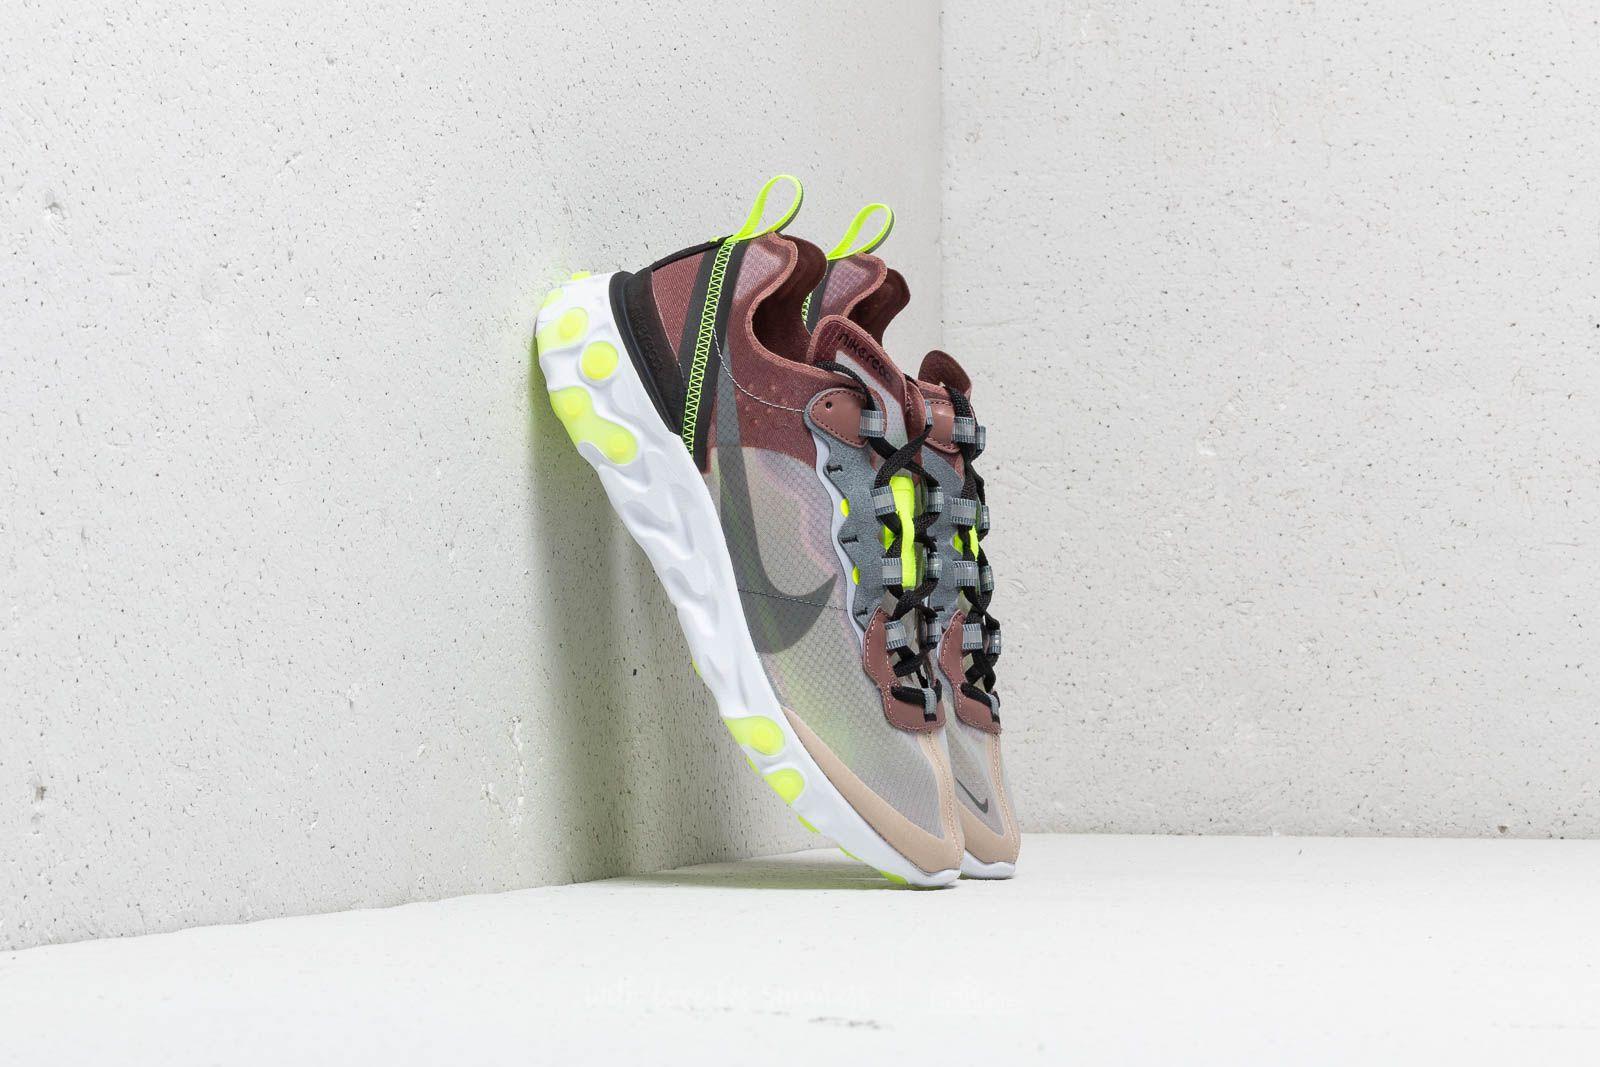 b7e0c8e46ee6d Nike React Element 87 Desert Sand  Cool Grey